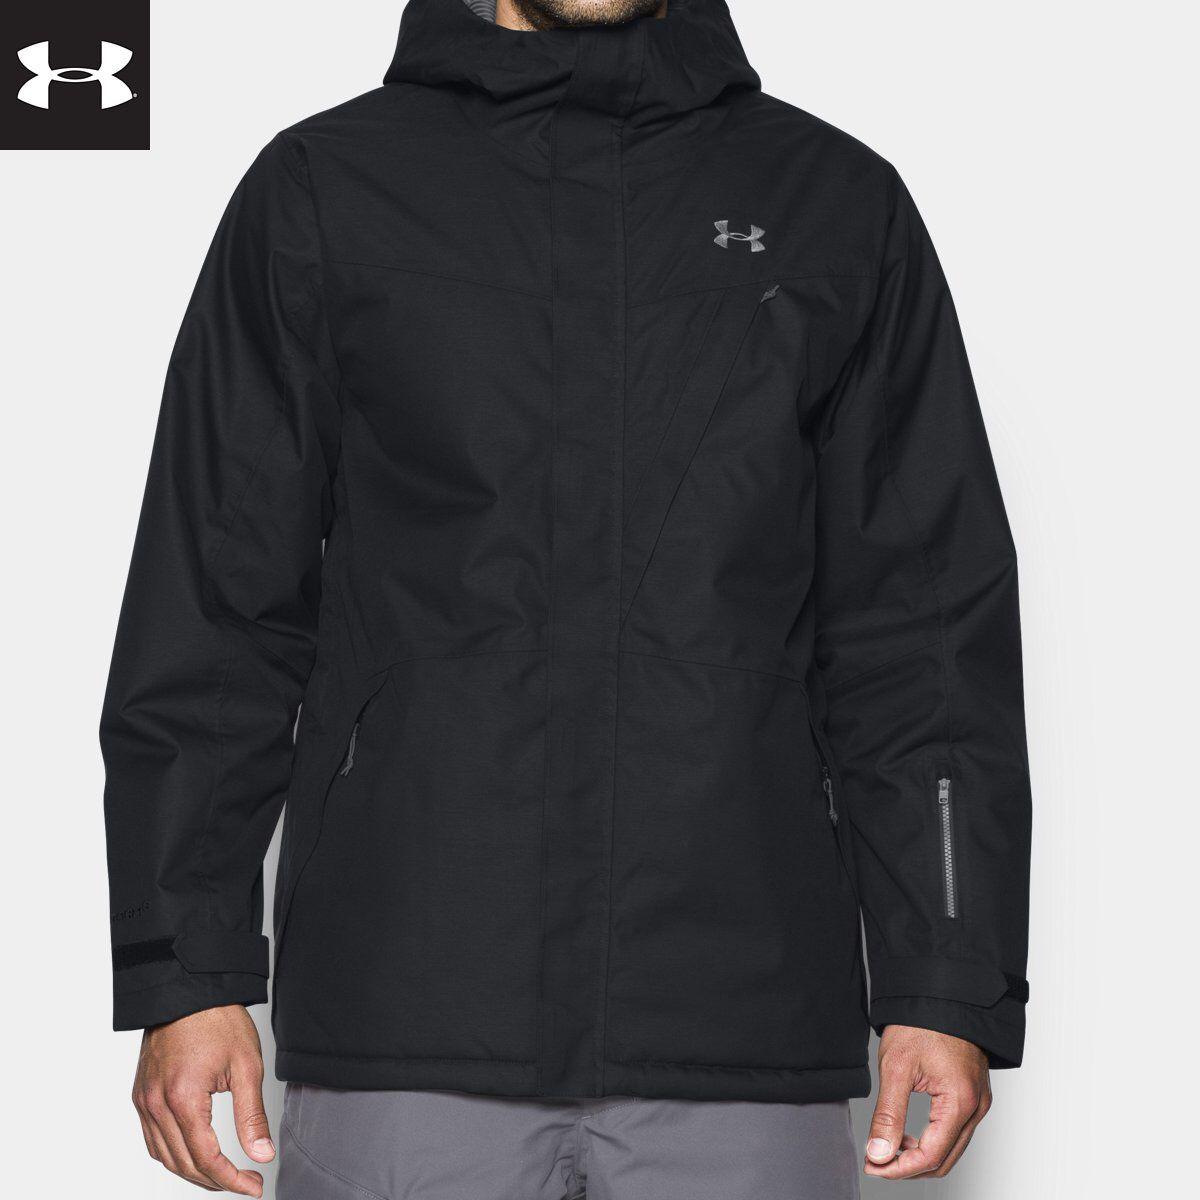 https://www.underarmour.com/en-us/mens-ua-storm-timbr-insulated-jacket/pid1280814